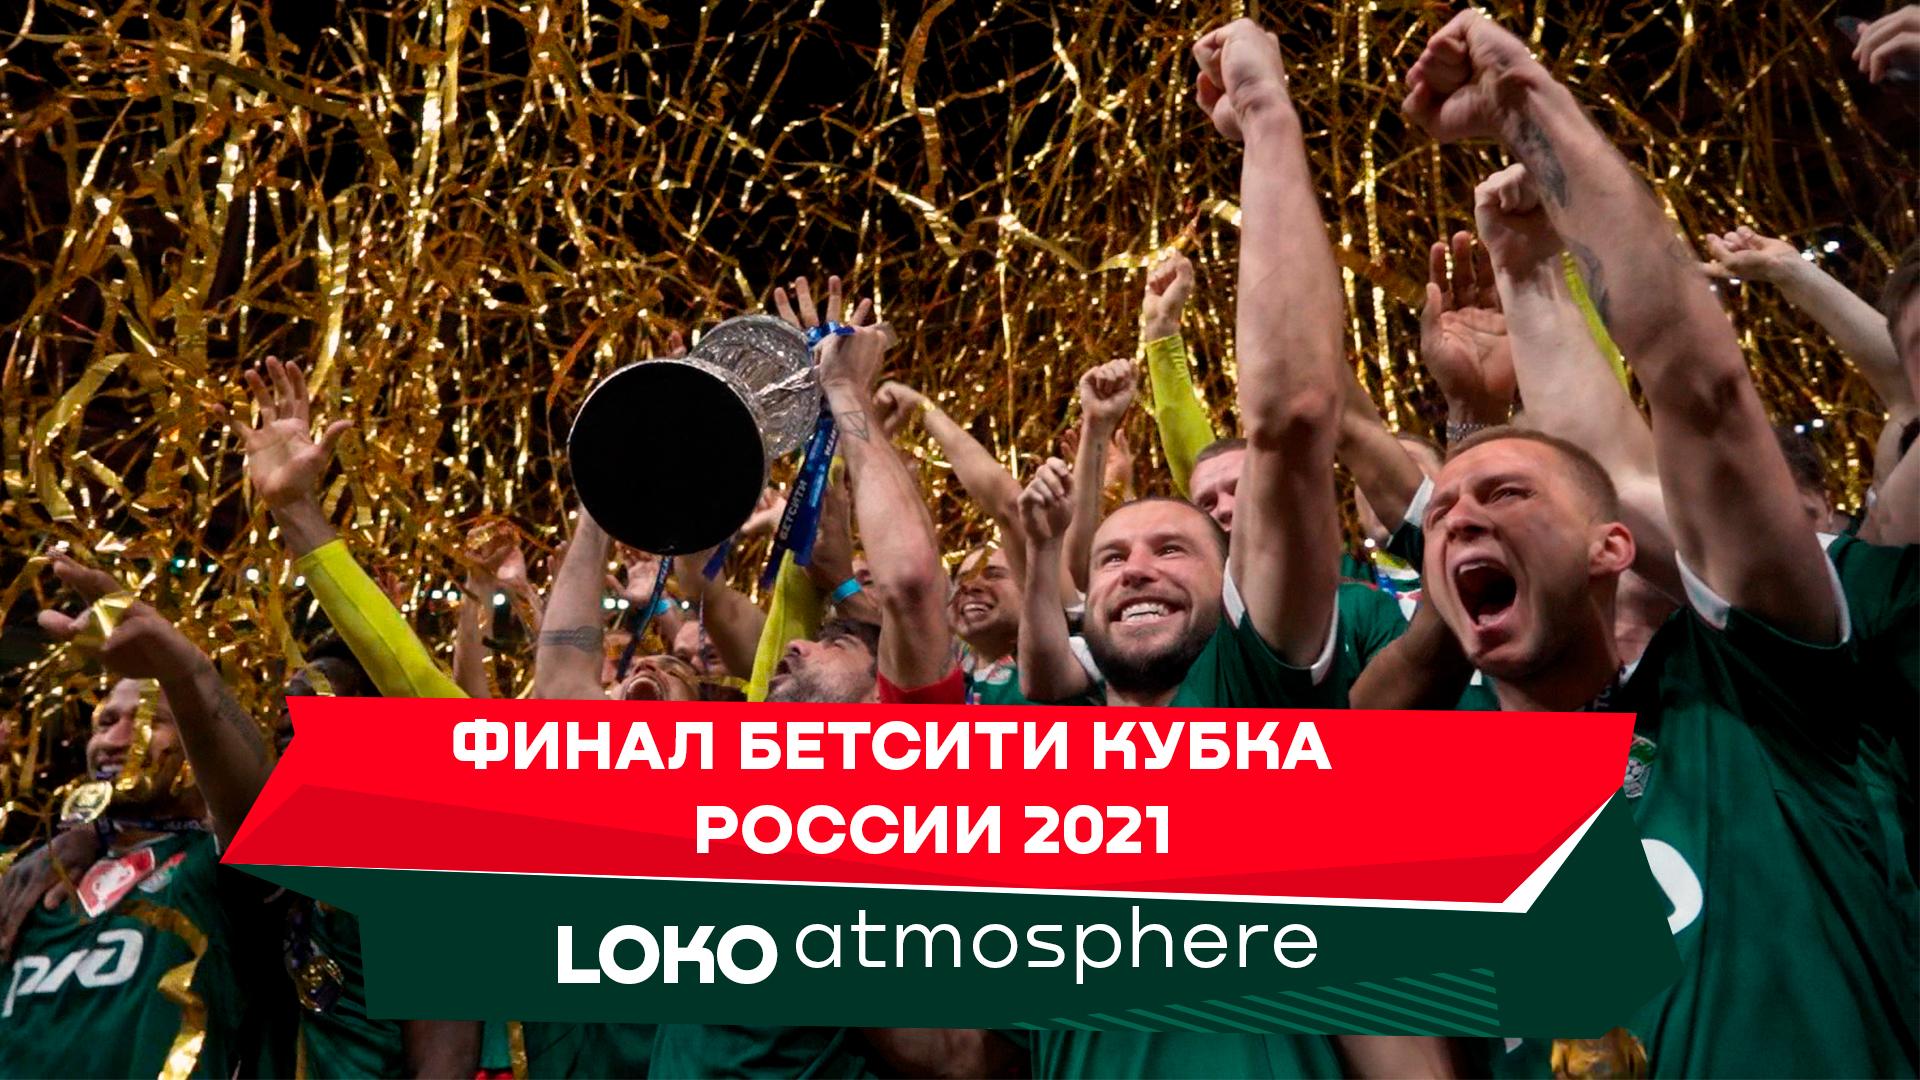 LOKO ATMOSPHERE // Забрали Бетсити Кубок России 2020/21!